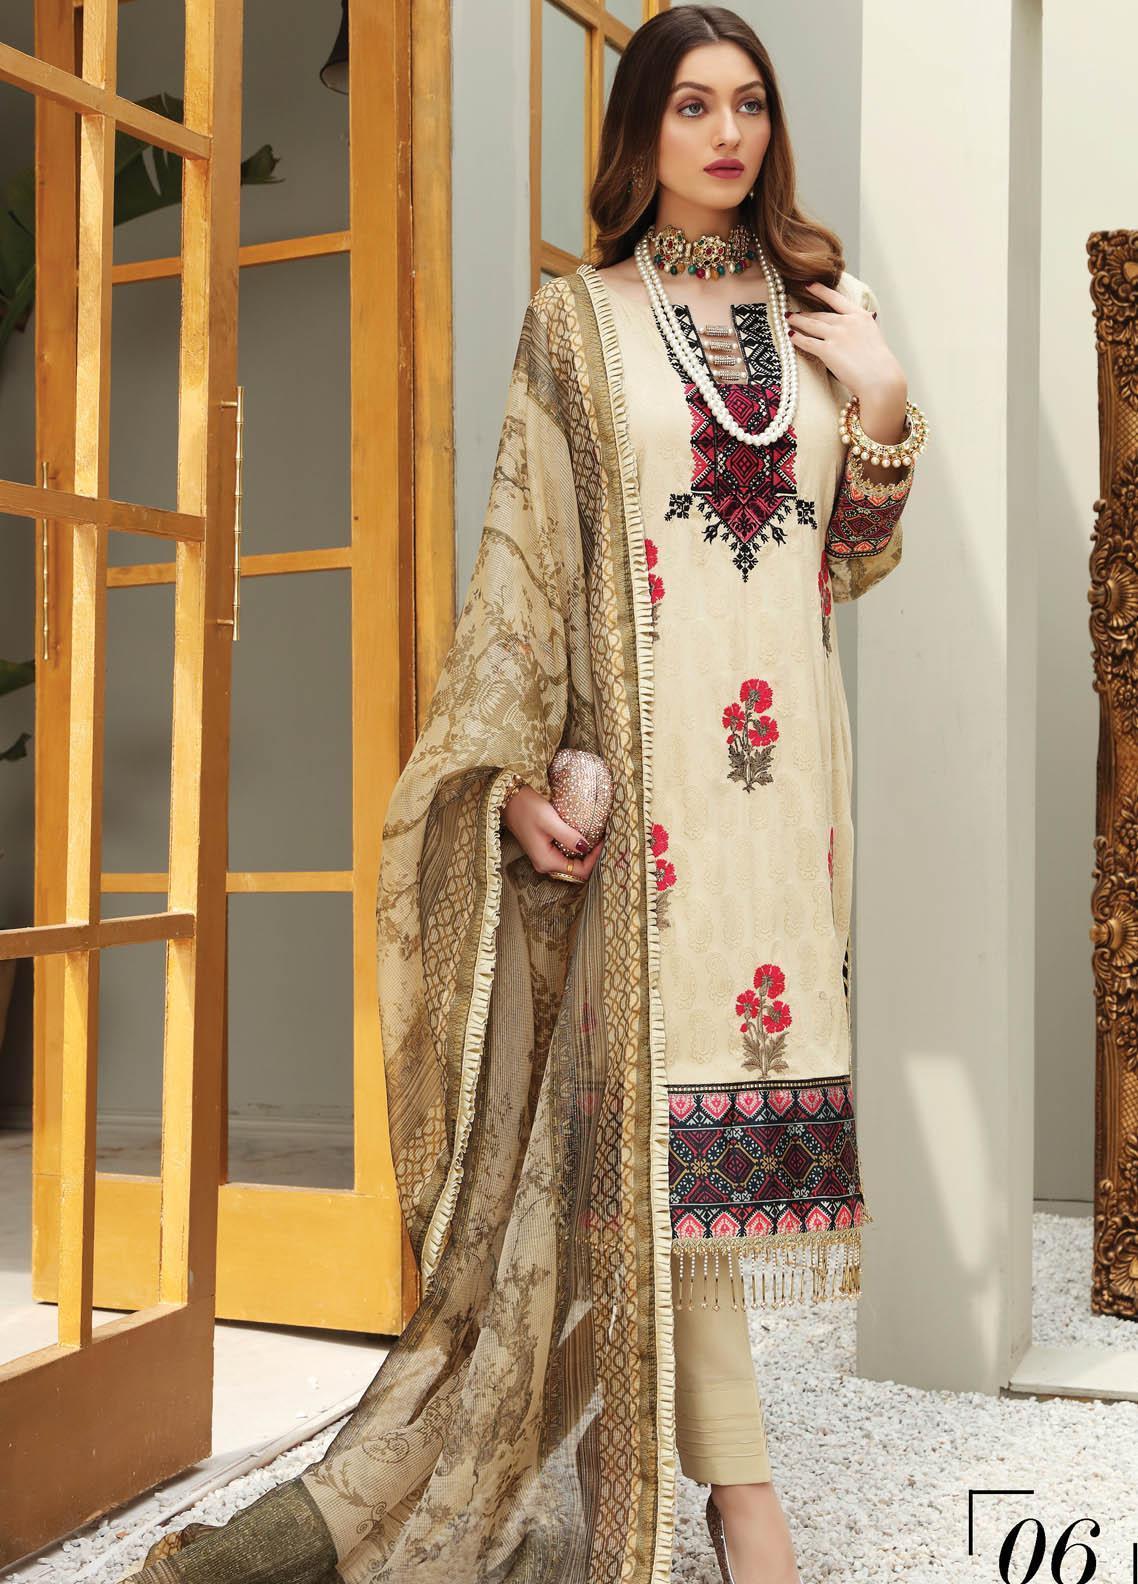 Festive Hues By Al Zohaib Embroidered Jacquard Suits Unstitched 3 Piece AZ21FH 06 - Festive Collection